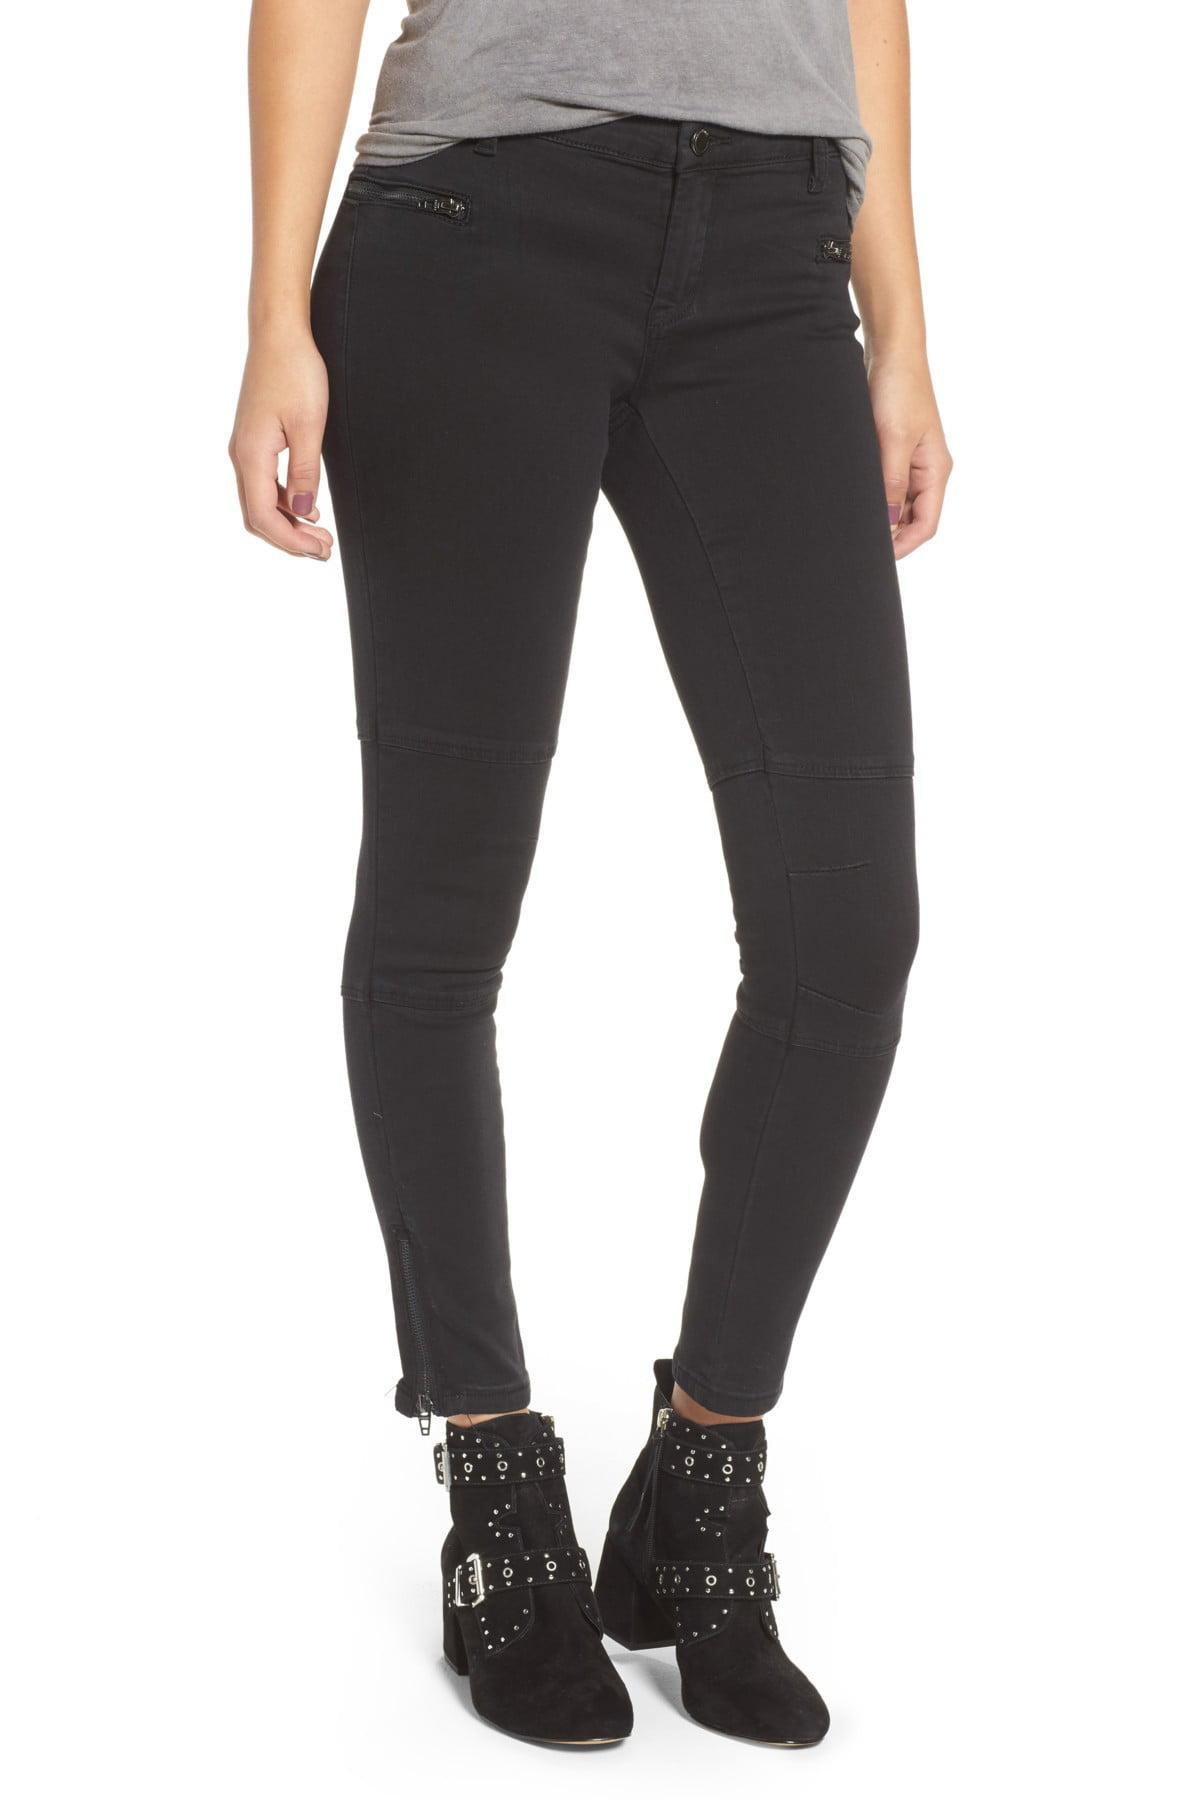 New With Tags M/&S Ladies Size 28 Reg Black Super Skinny Jeans W44 to 52 X 28L